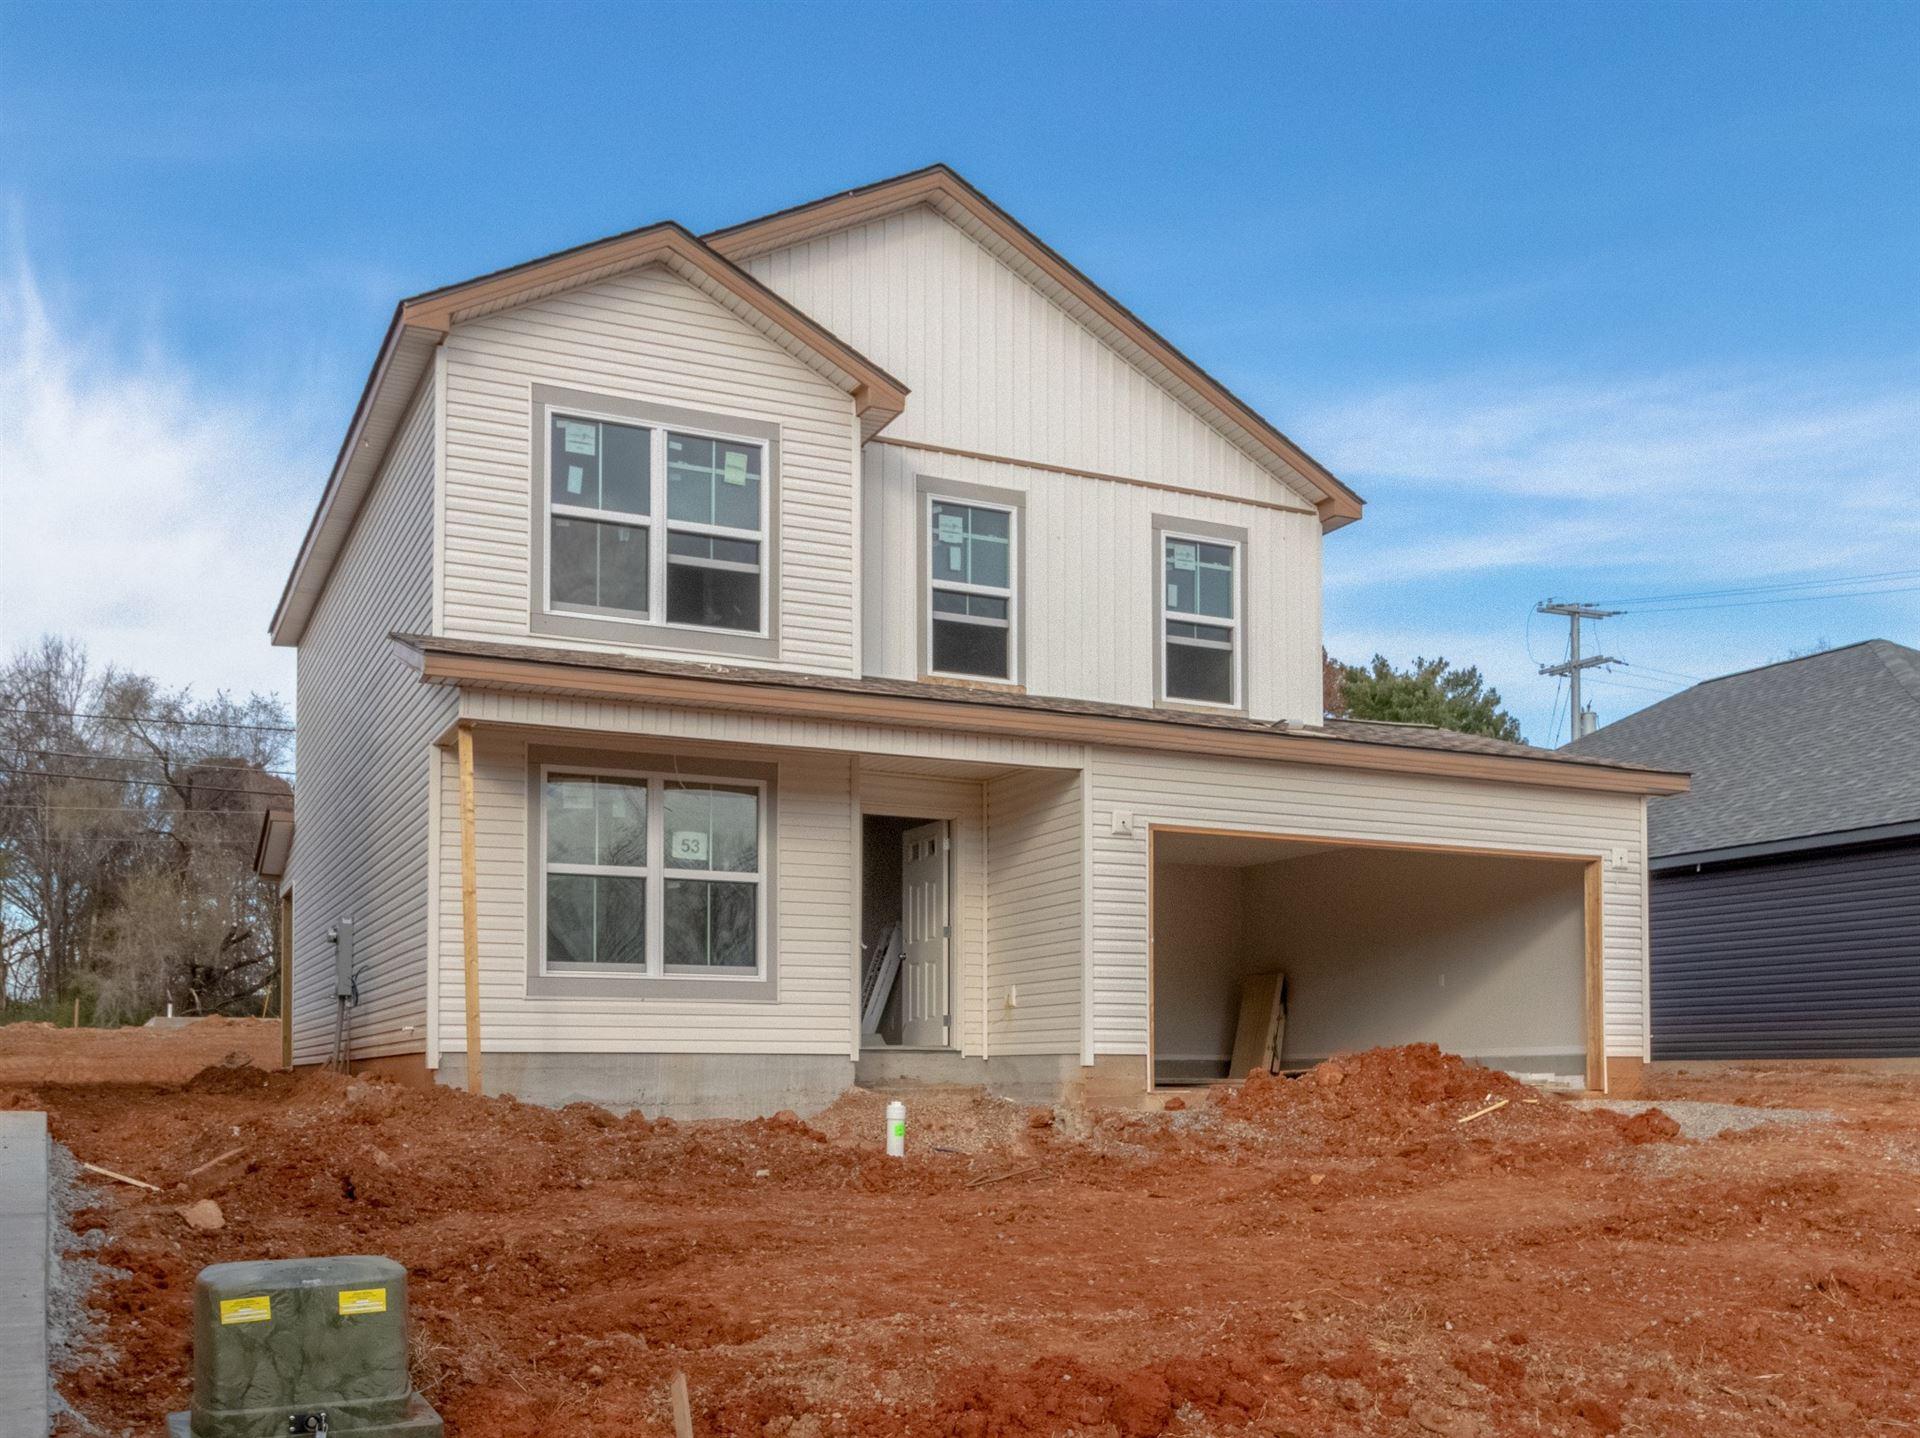 53 Campbell Heights, Clarksville, TN 37042 - MLS#: 2290567